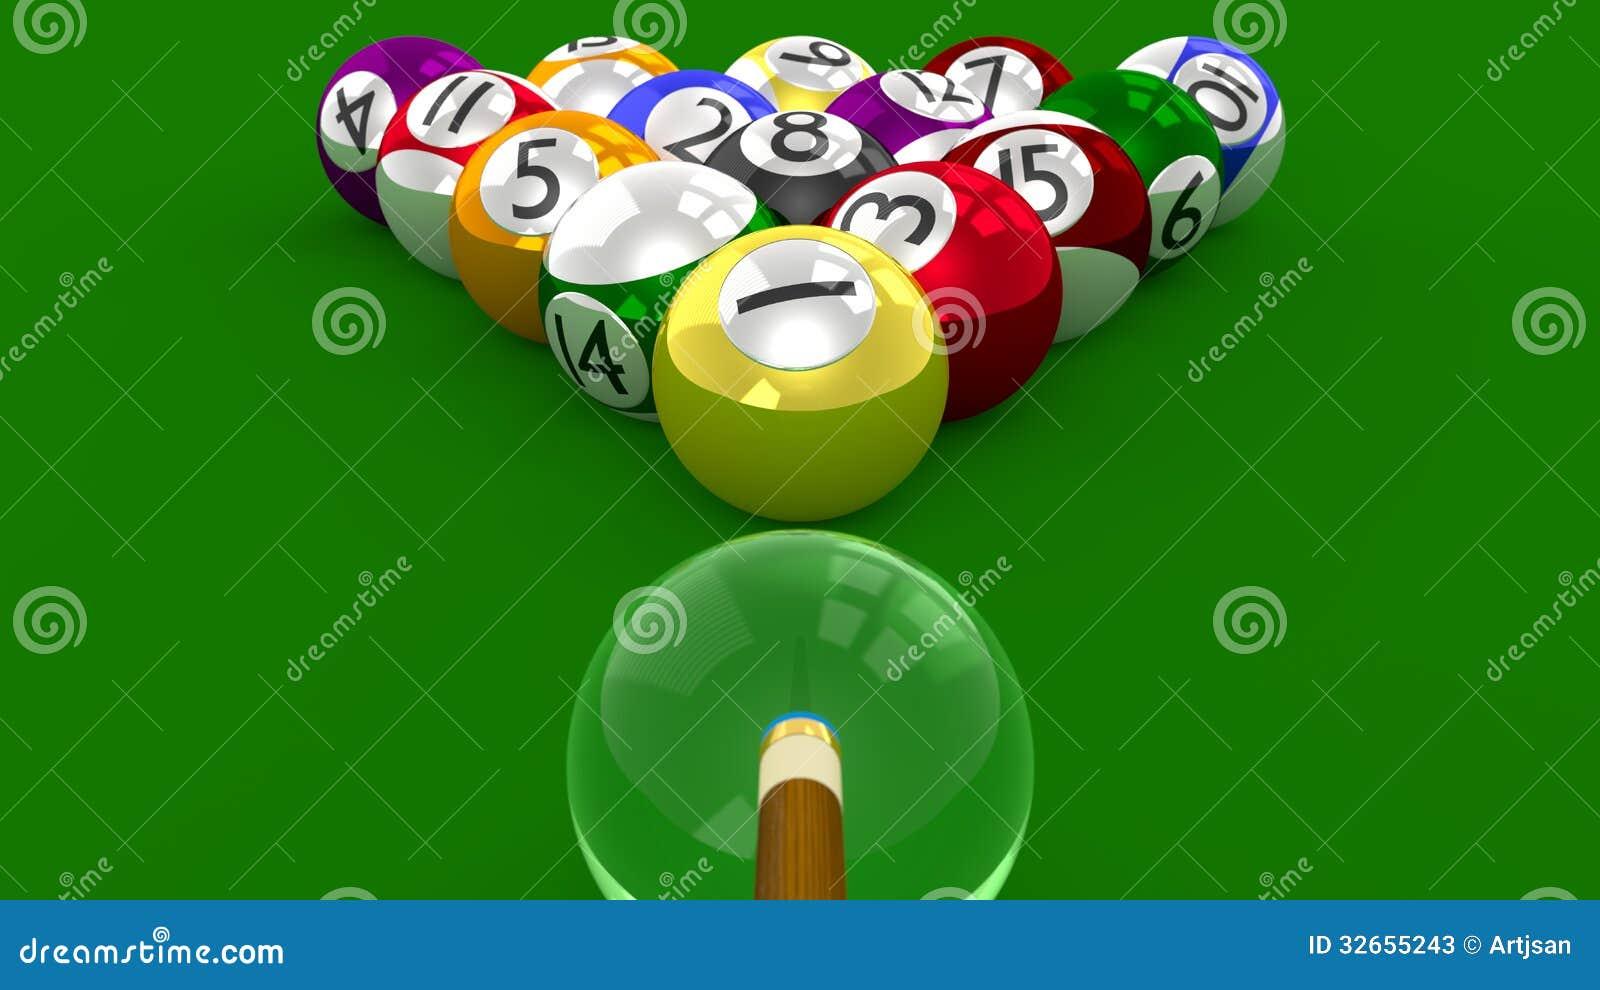 8 ball pool 3d game all ball randomly racked ready for for 8 ball pool design